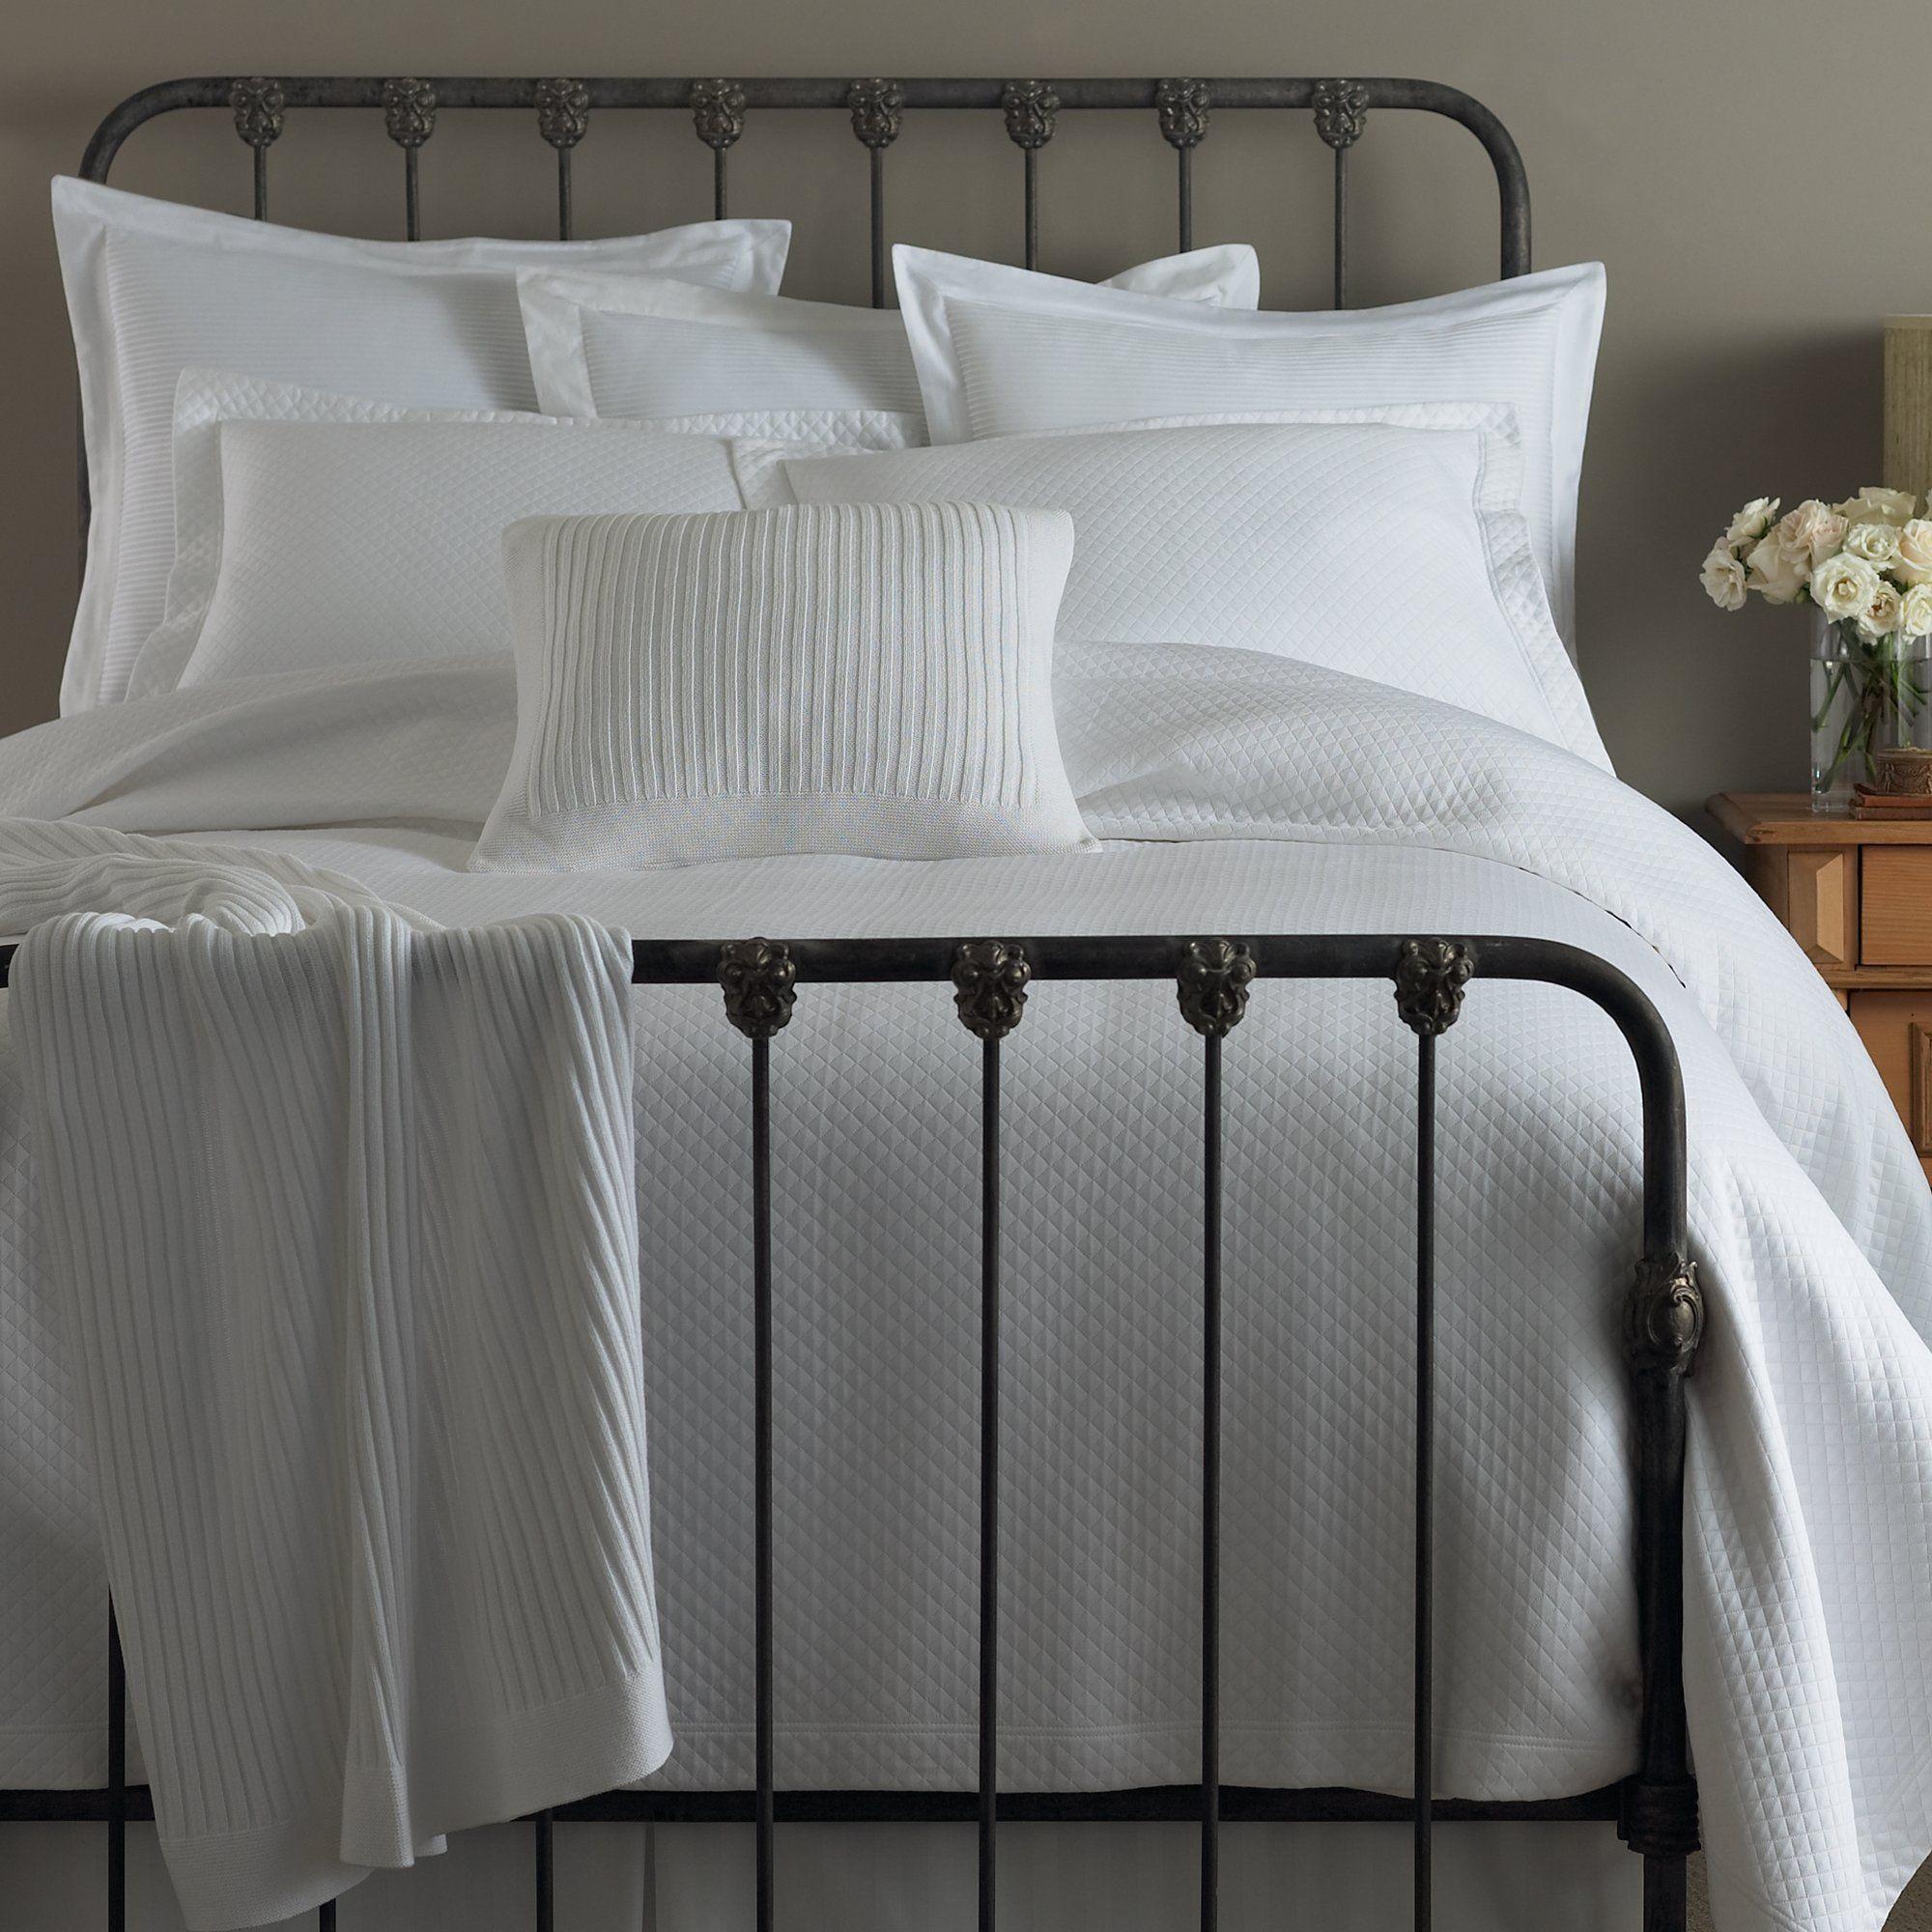 Oxford Matelassé Coverlet Bed, Bedding sets, Luxury bedding